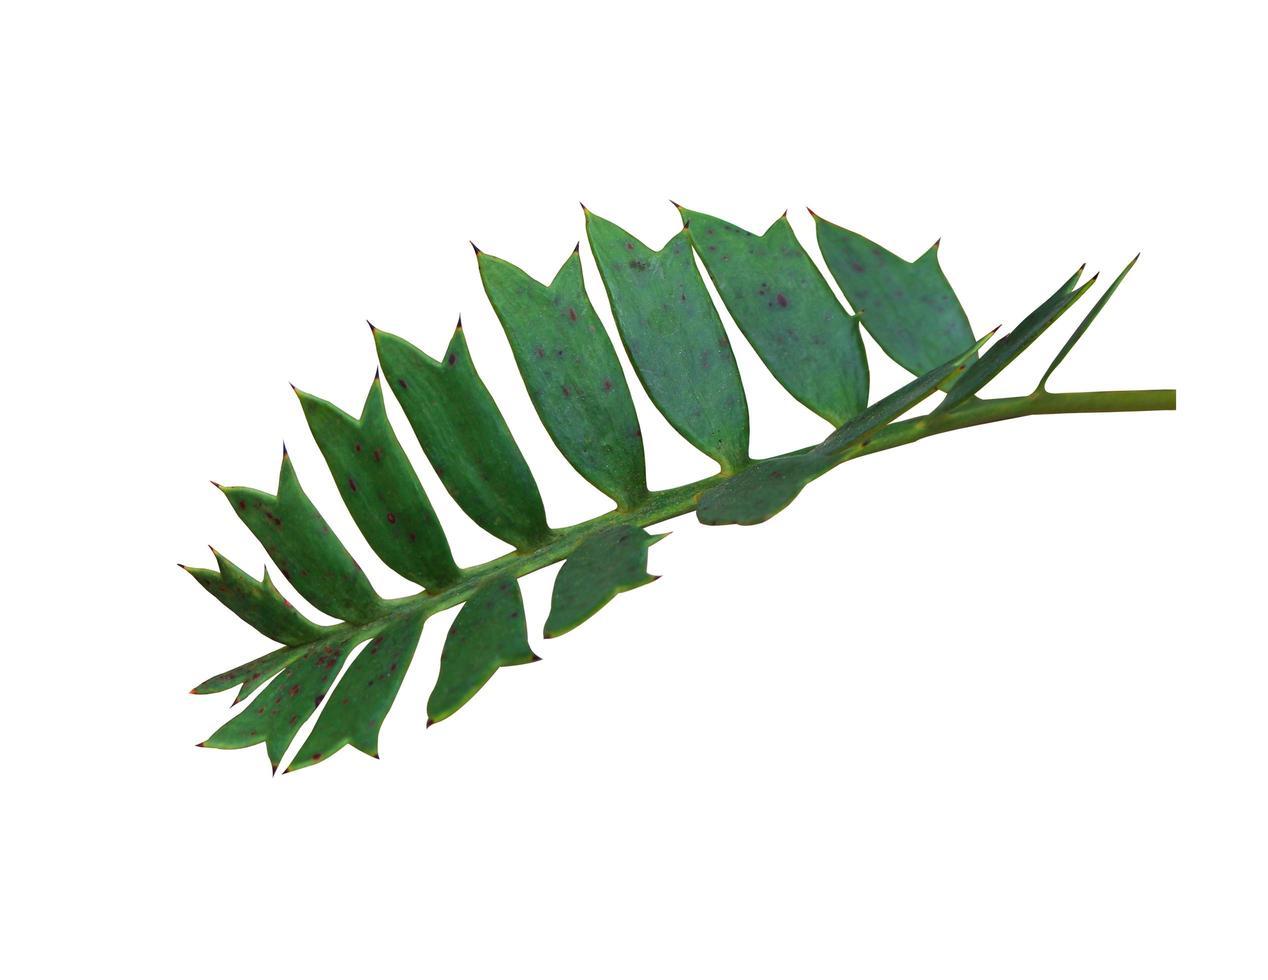 foglie appuntite verdi su bianco foto